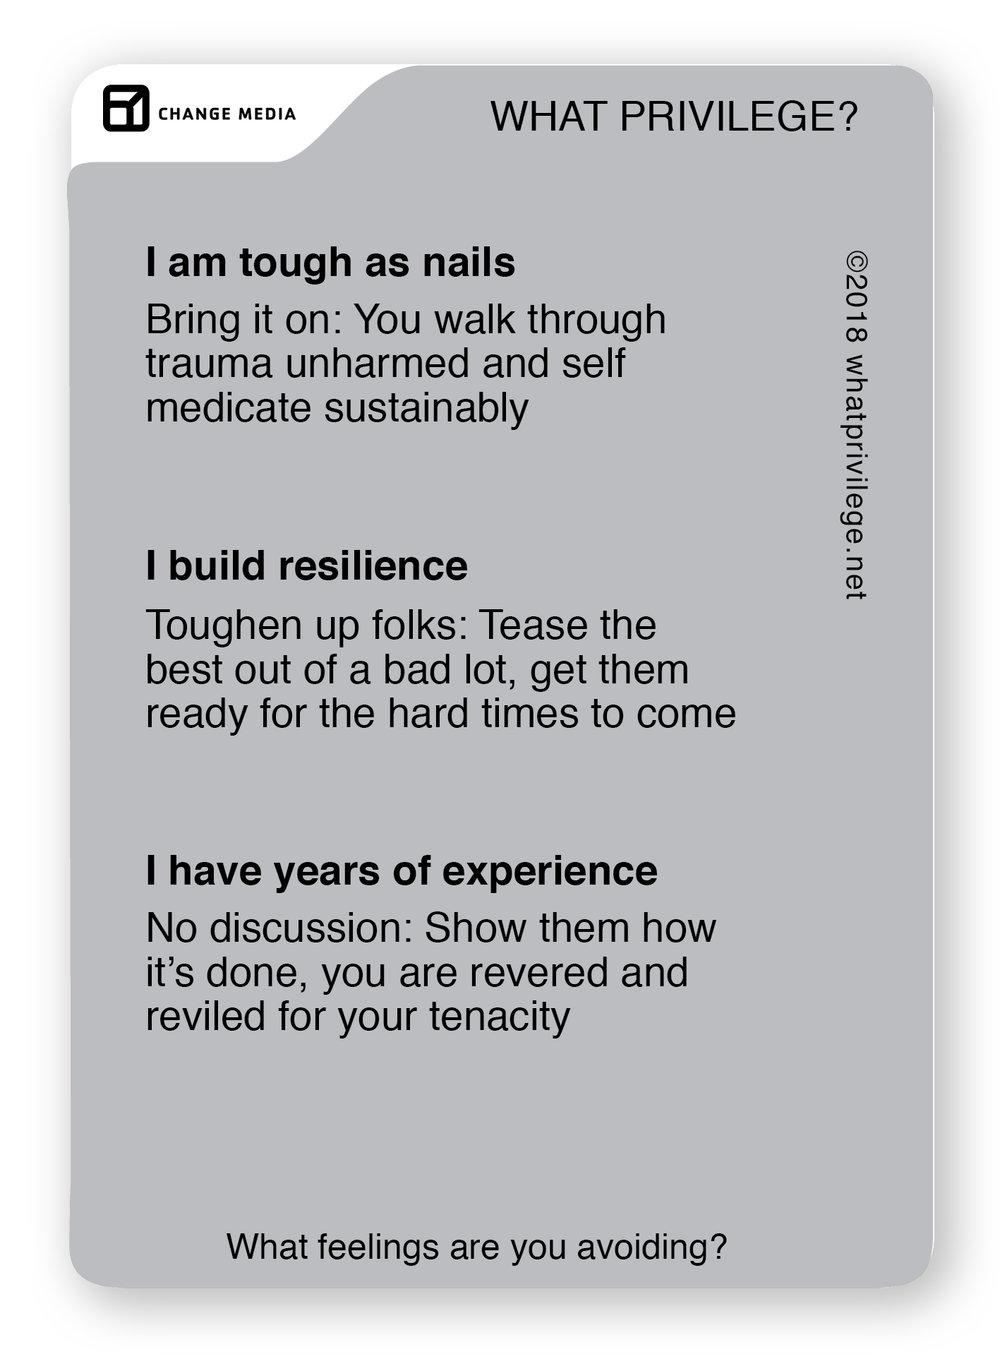 whatprivilege-emotions10-back.jpg